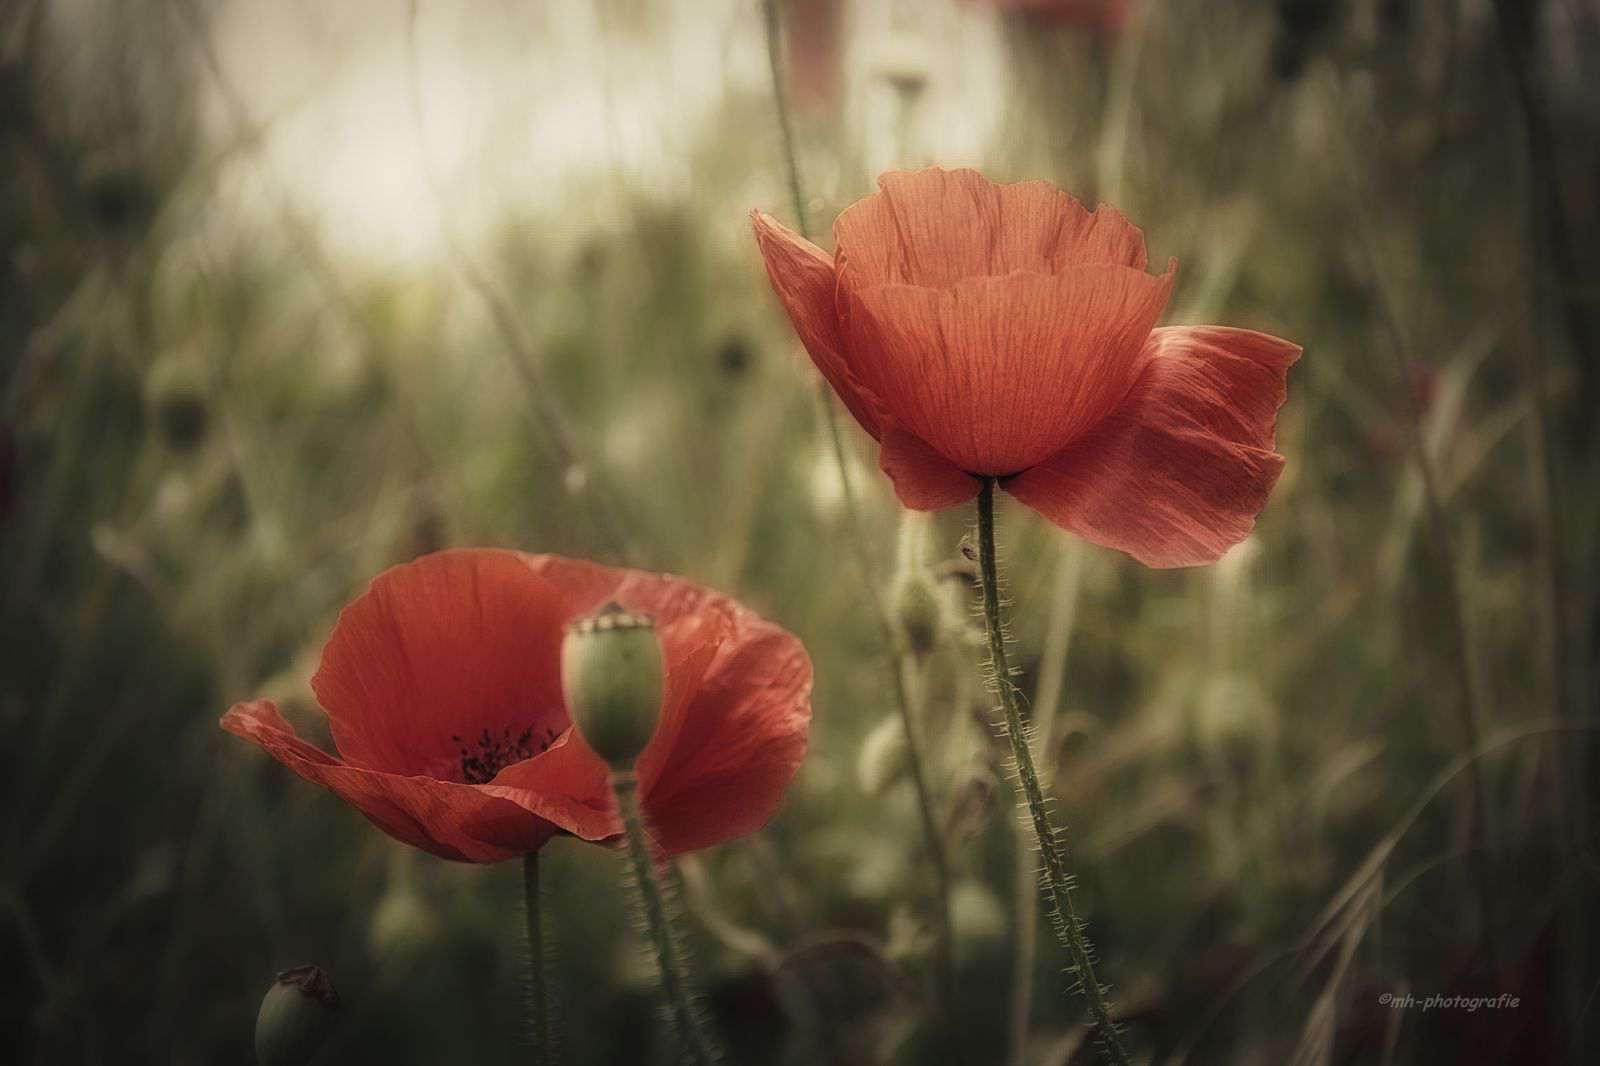 Blumen-DSC_4920-mh-photografie